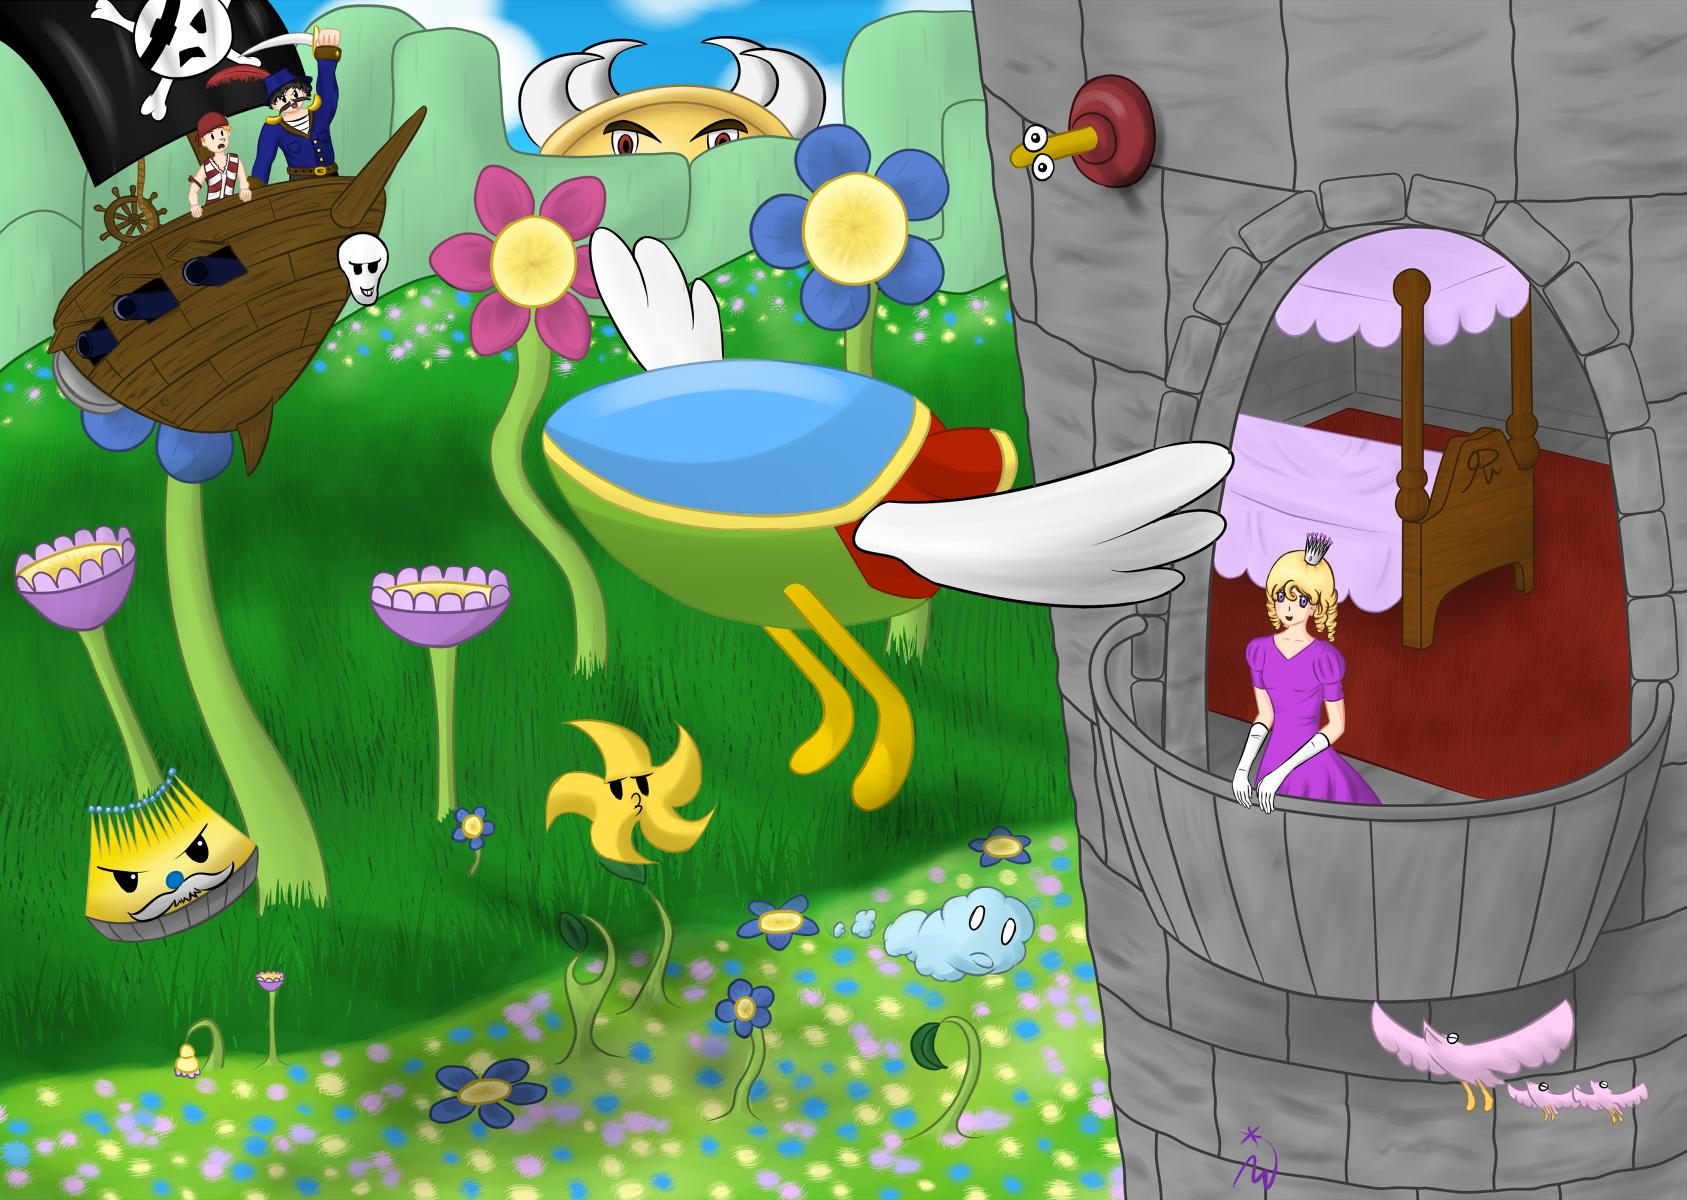 Fantasy Zone: Return to Fantasy Zone by Dumdodoor